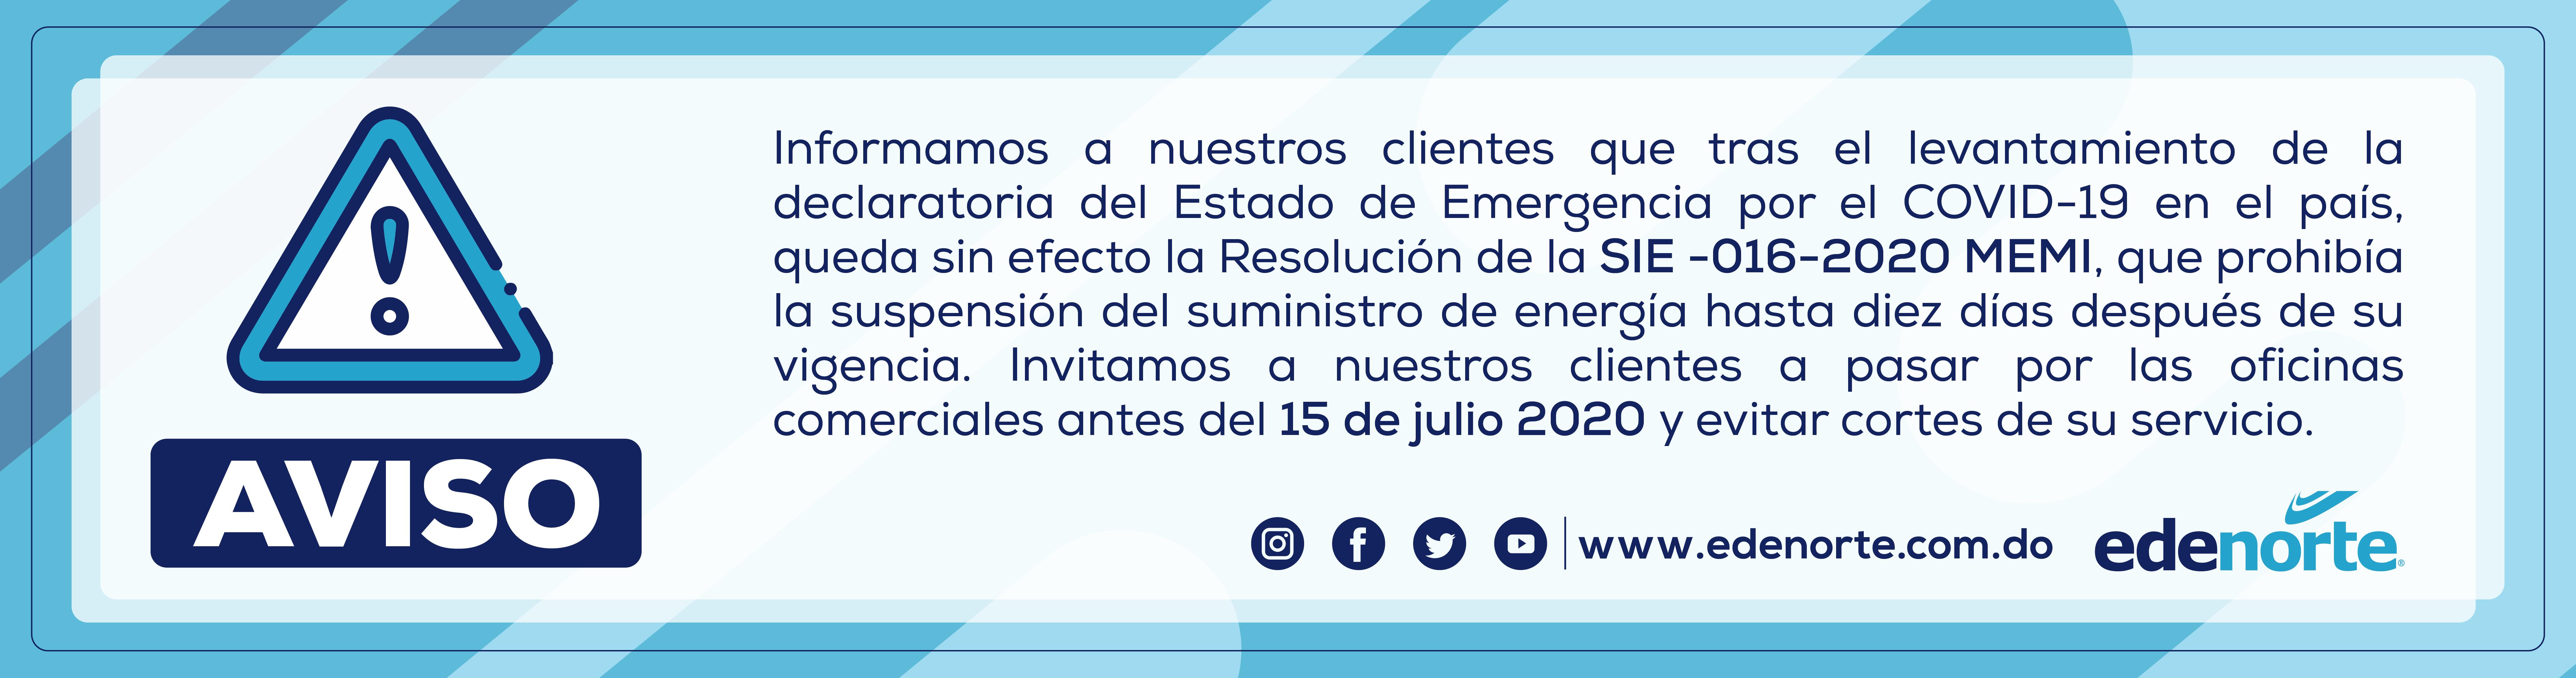 D:\OneDrive - Edenorte Dominicana, S.A\WEB\2020\07 - Julio\Aviso - Sin efecto Resolución SIE-016-2020 MEMI